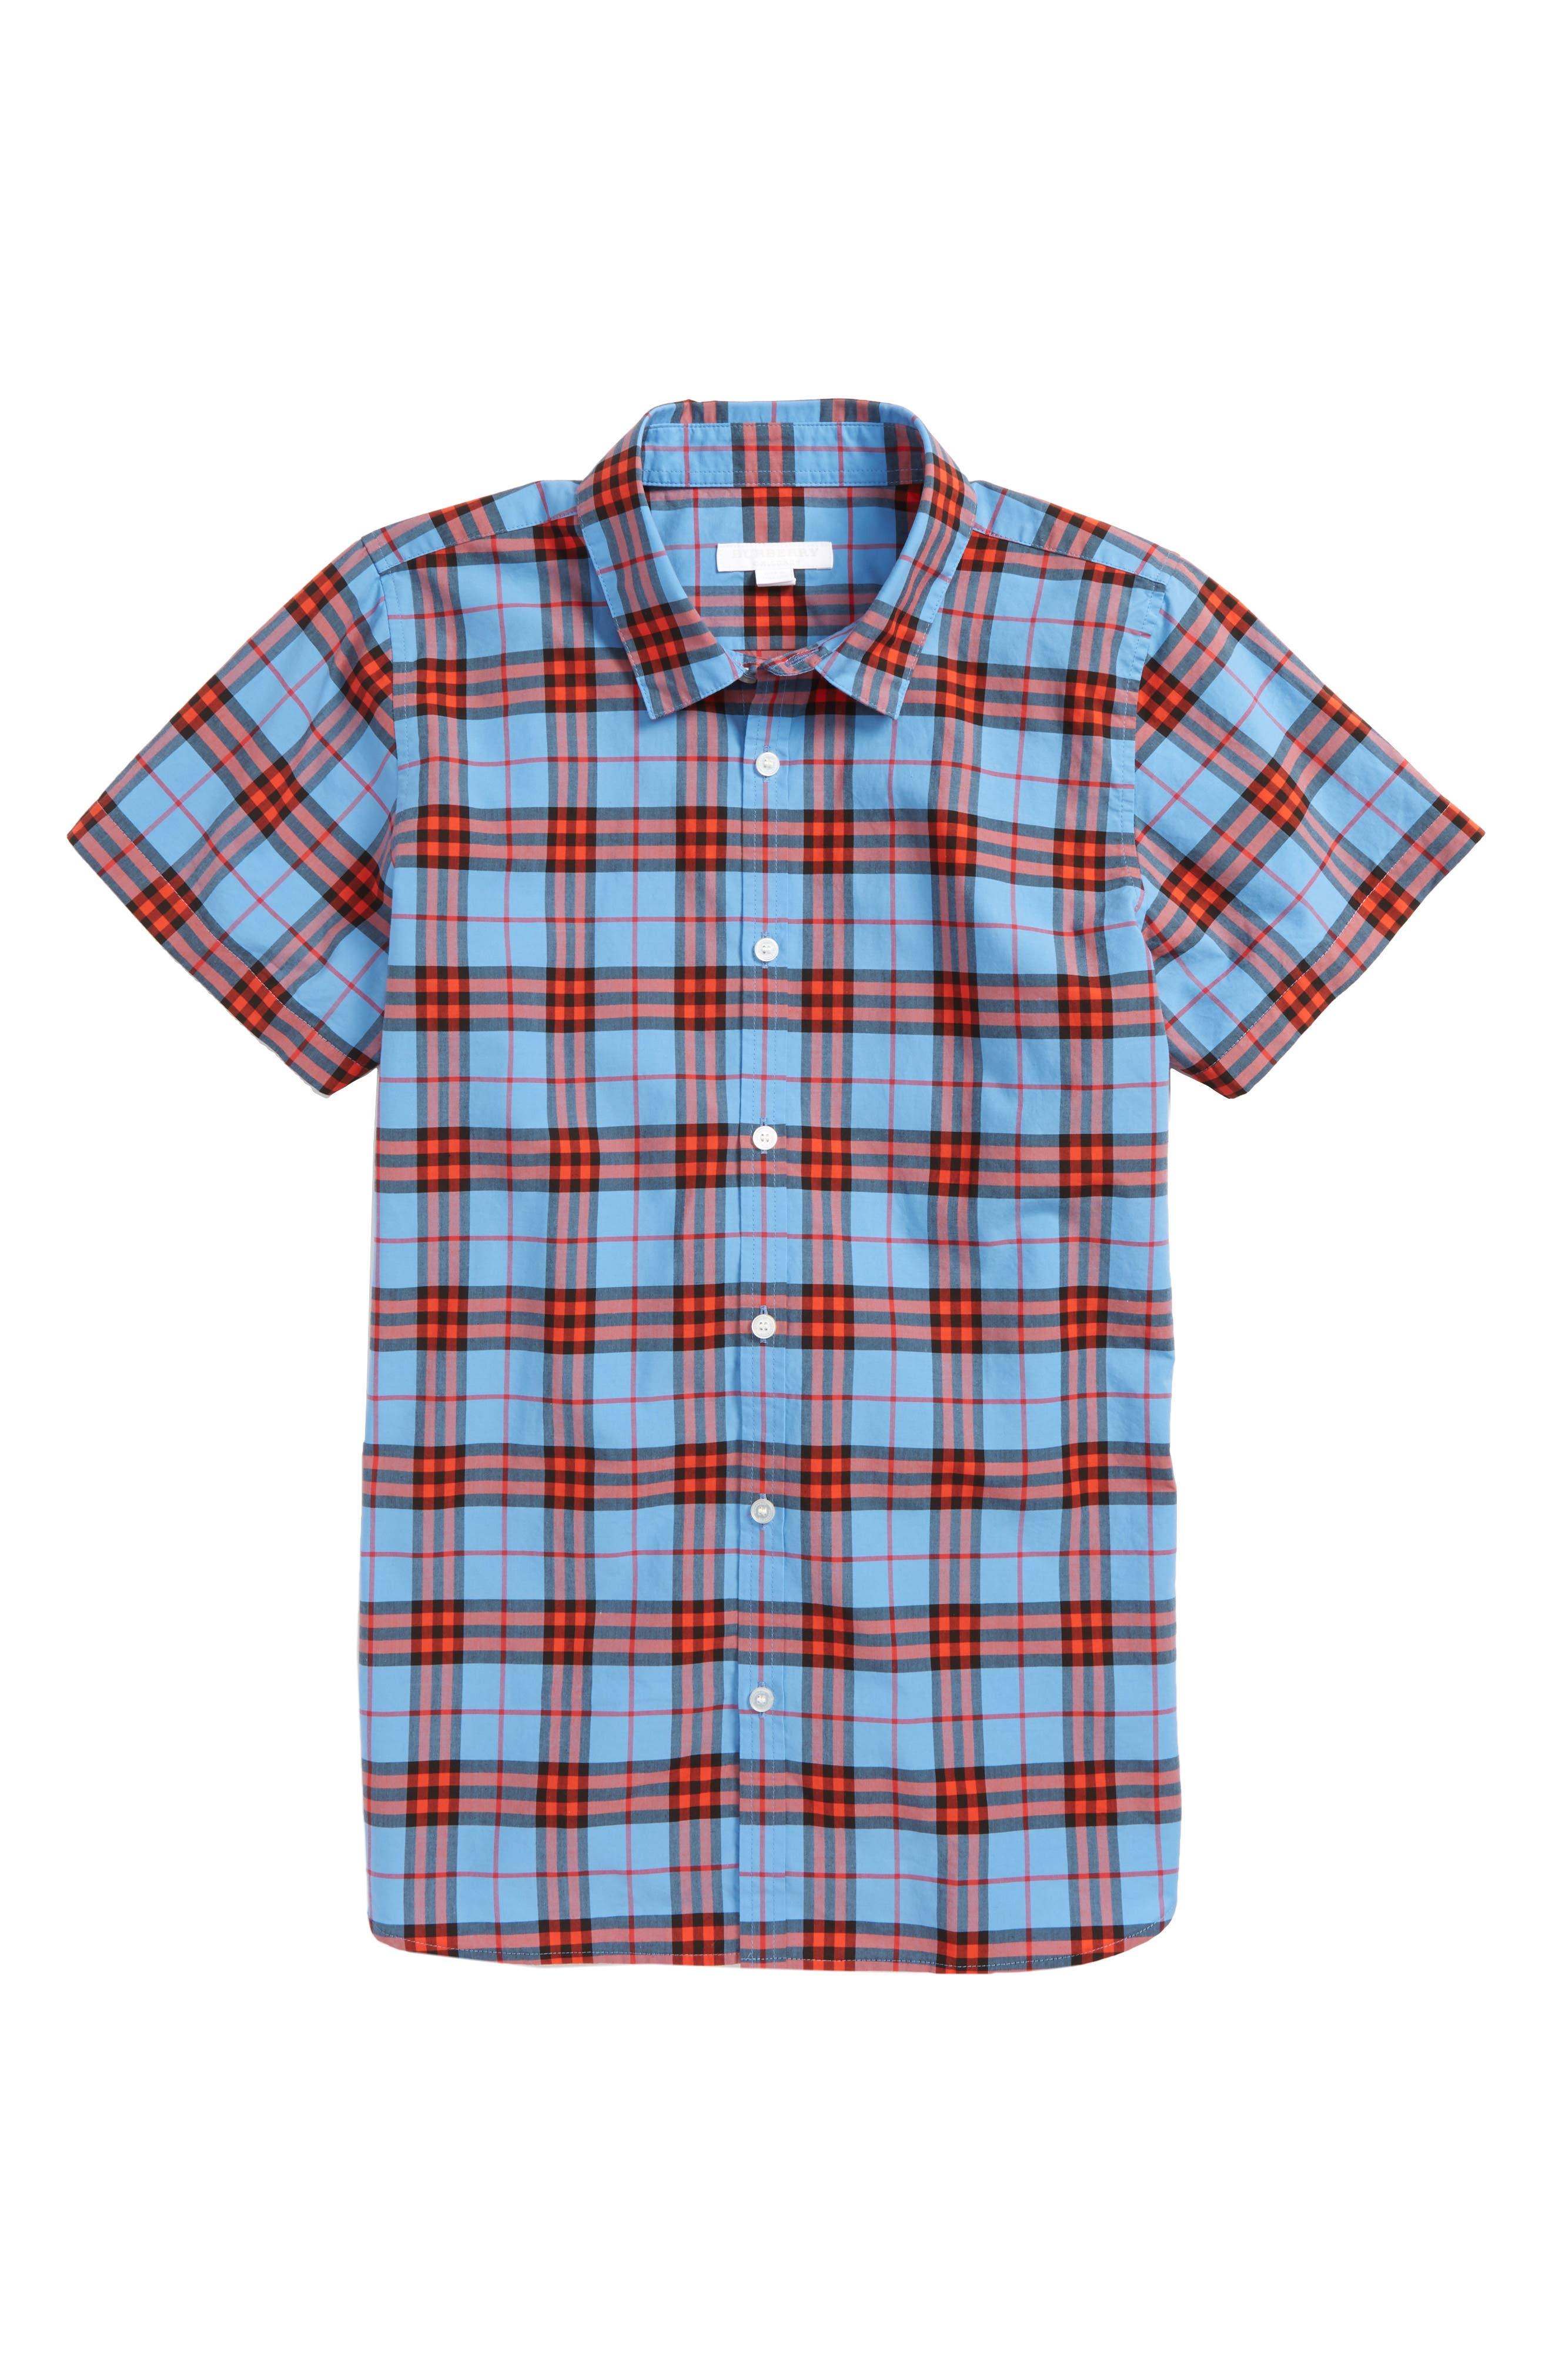 Burberry Clarkey Plaid Woven Shirt (Little Boys & Big Boys)